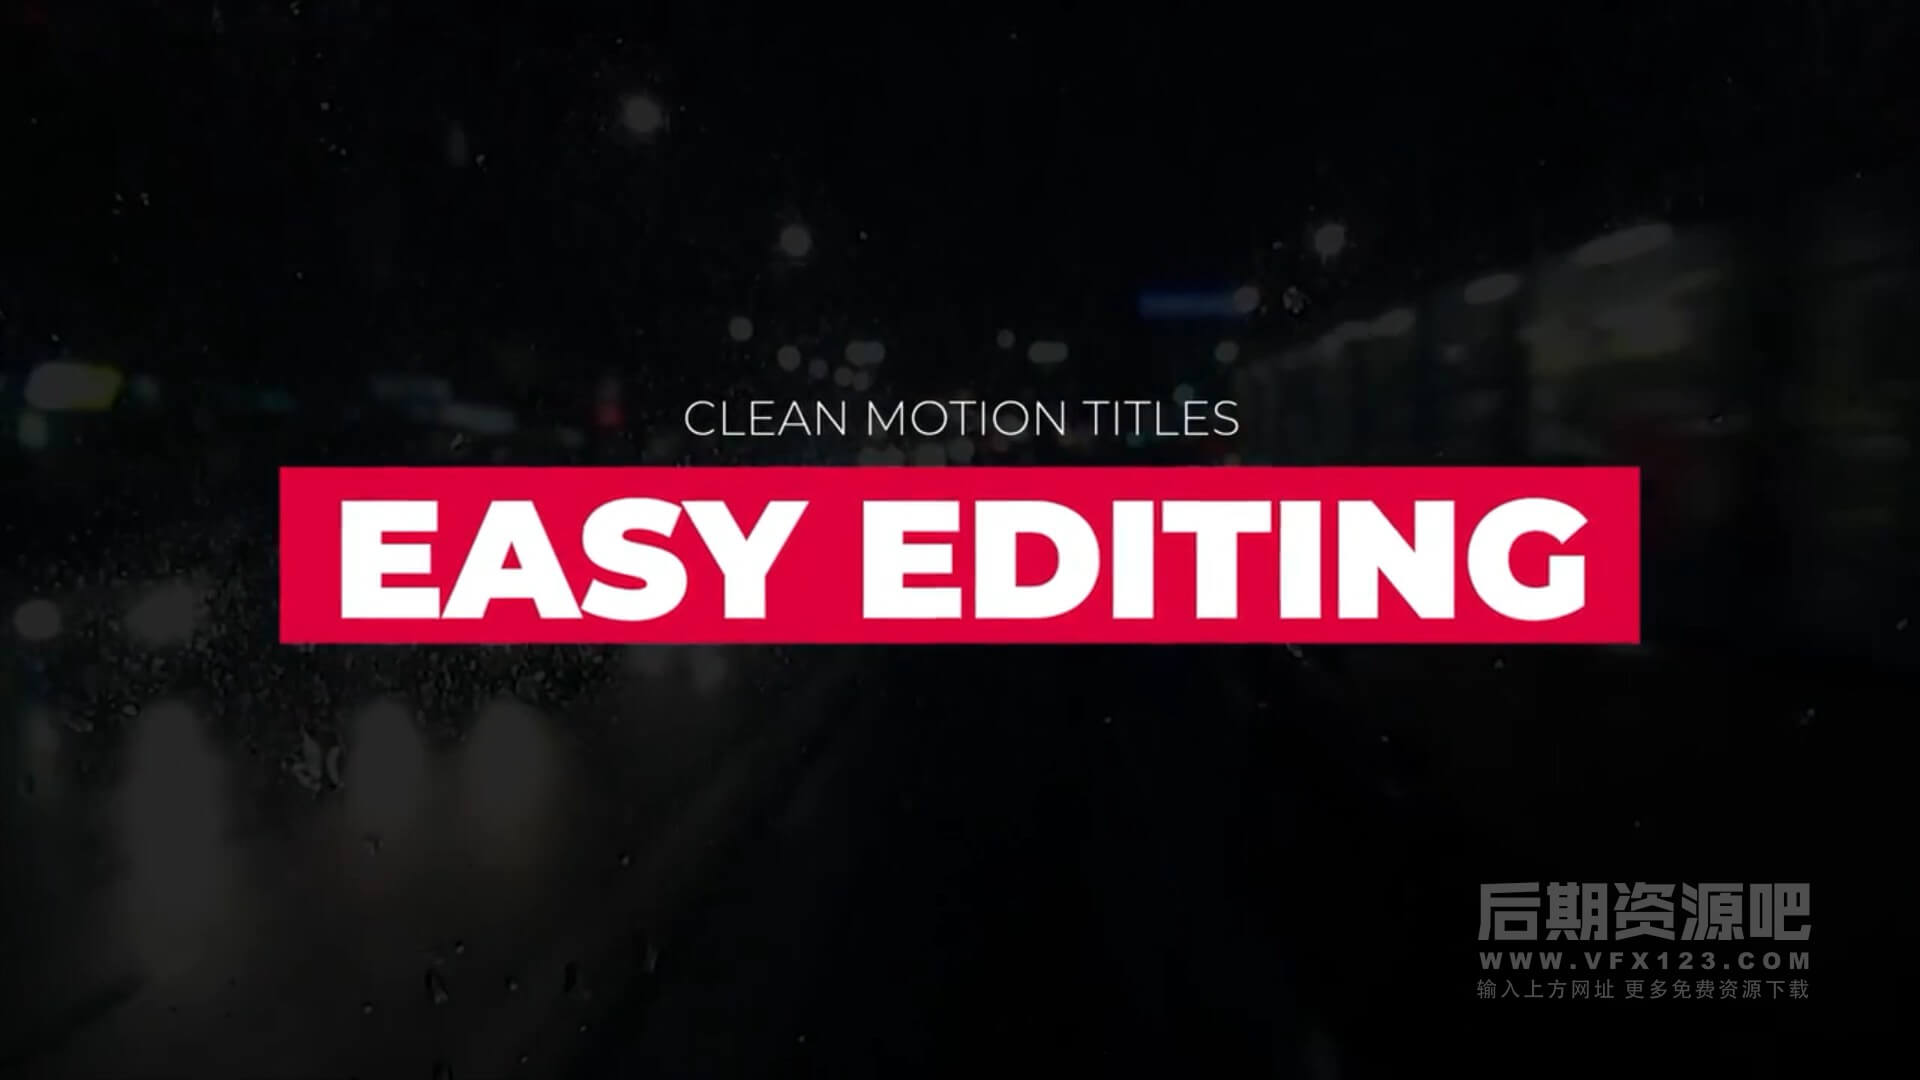 fcpx标题插件 14组简约风格创意标题动画预设 Unique Typography V2